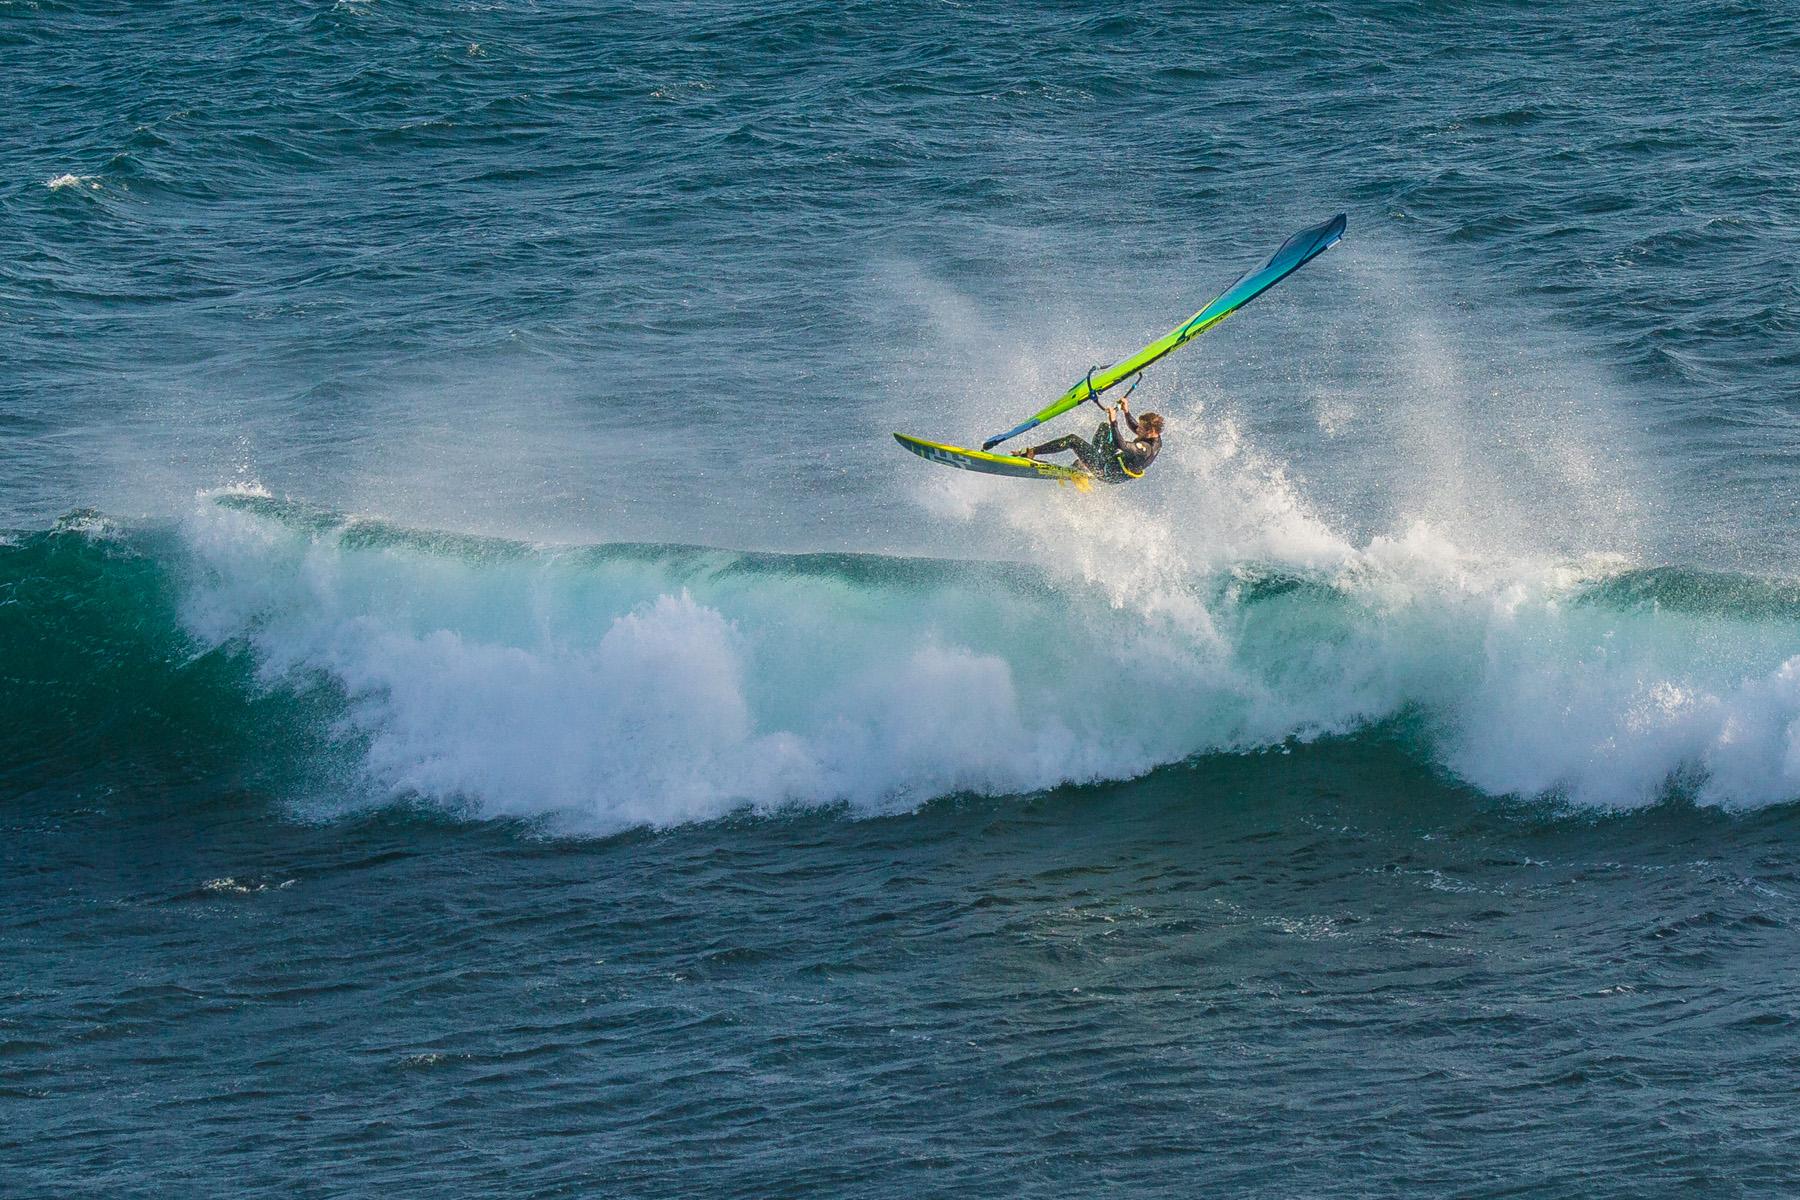 alastair mcleod windsurfing flynns reef on phillip island